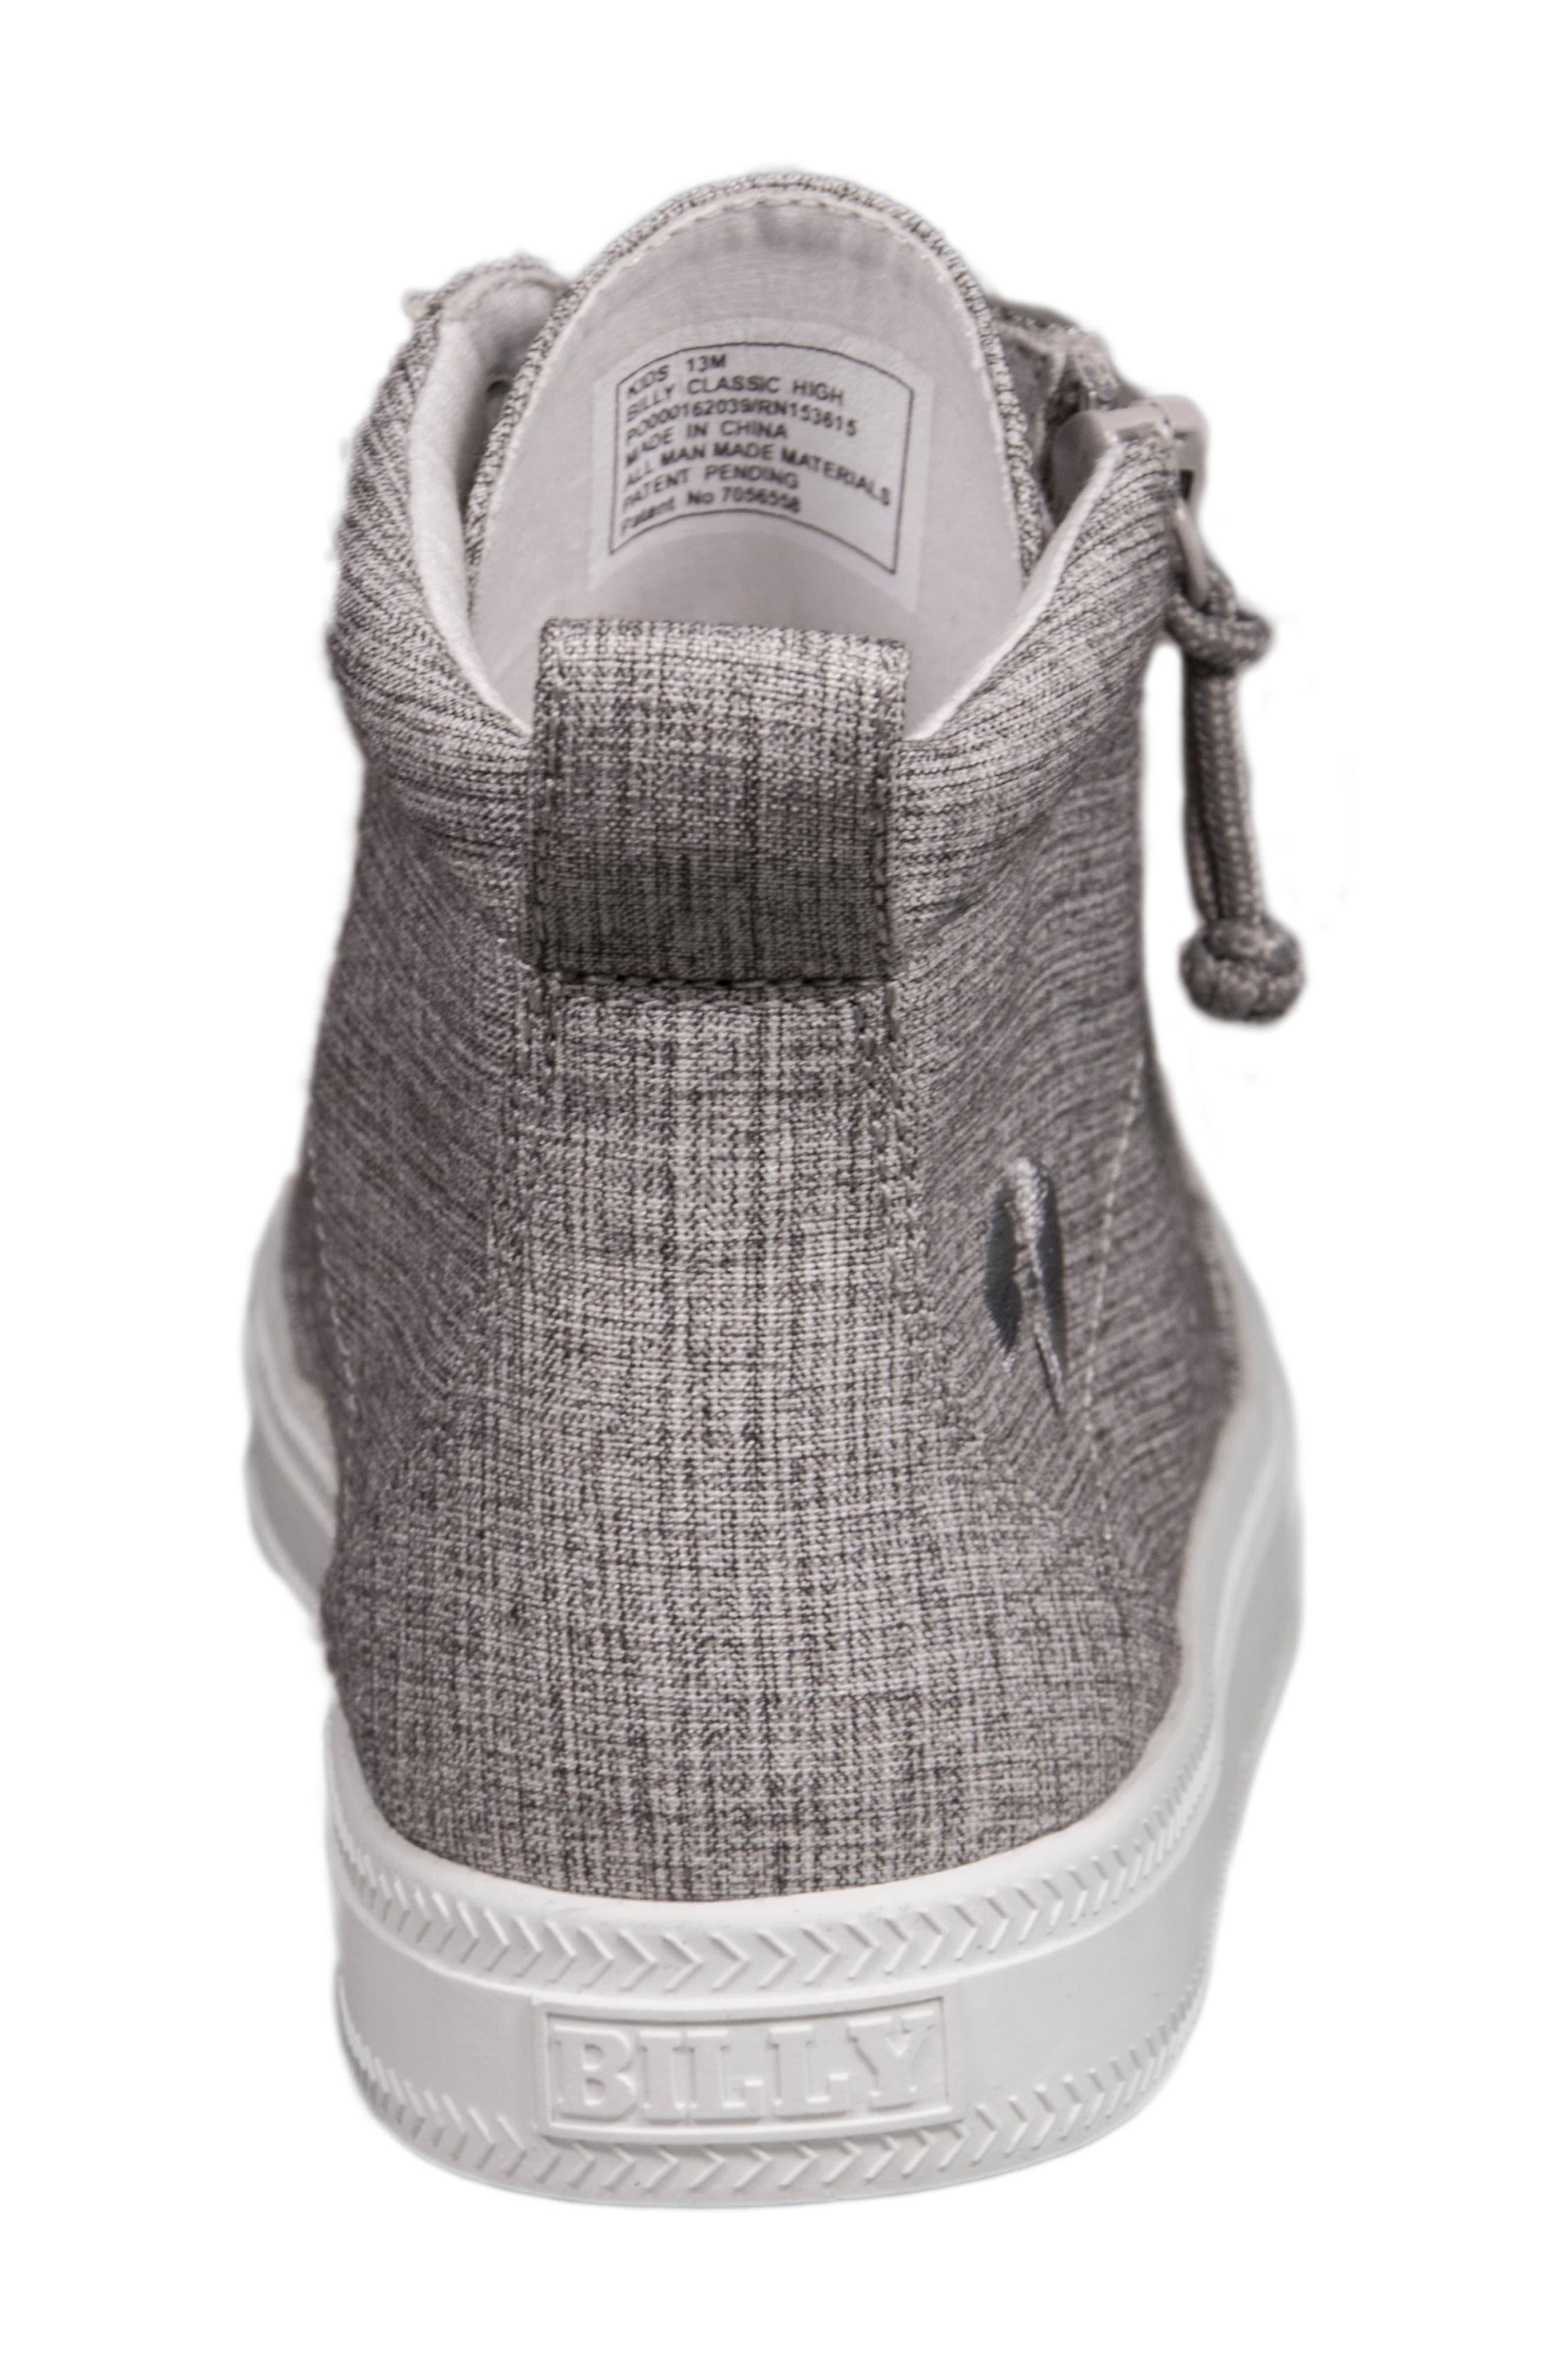 Zip Around High Top Sneaker,                             Alternate thumbnail 7, color,                             GREY JERSEY